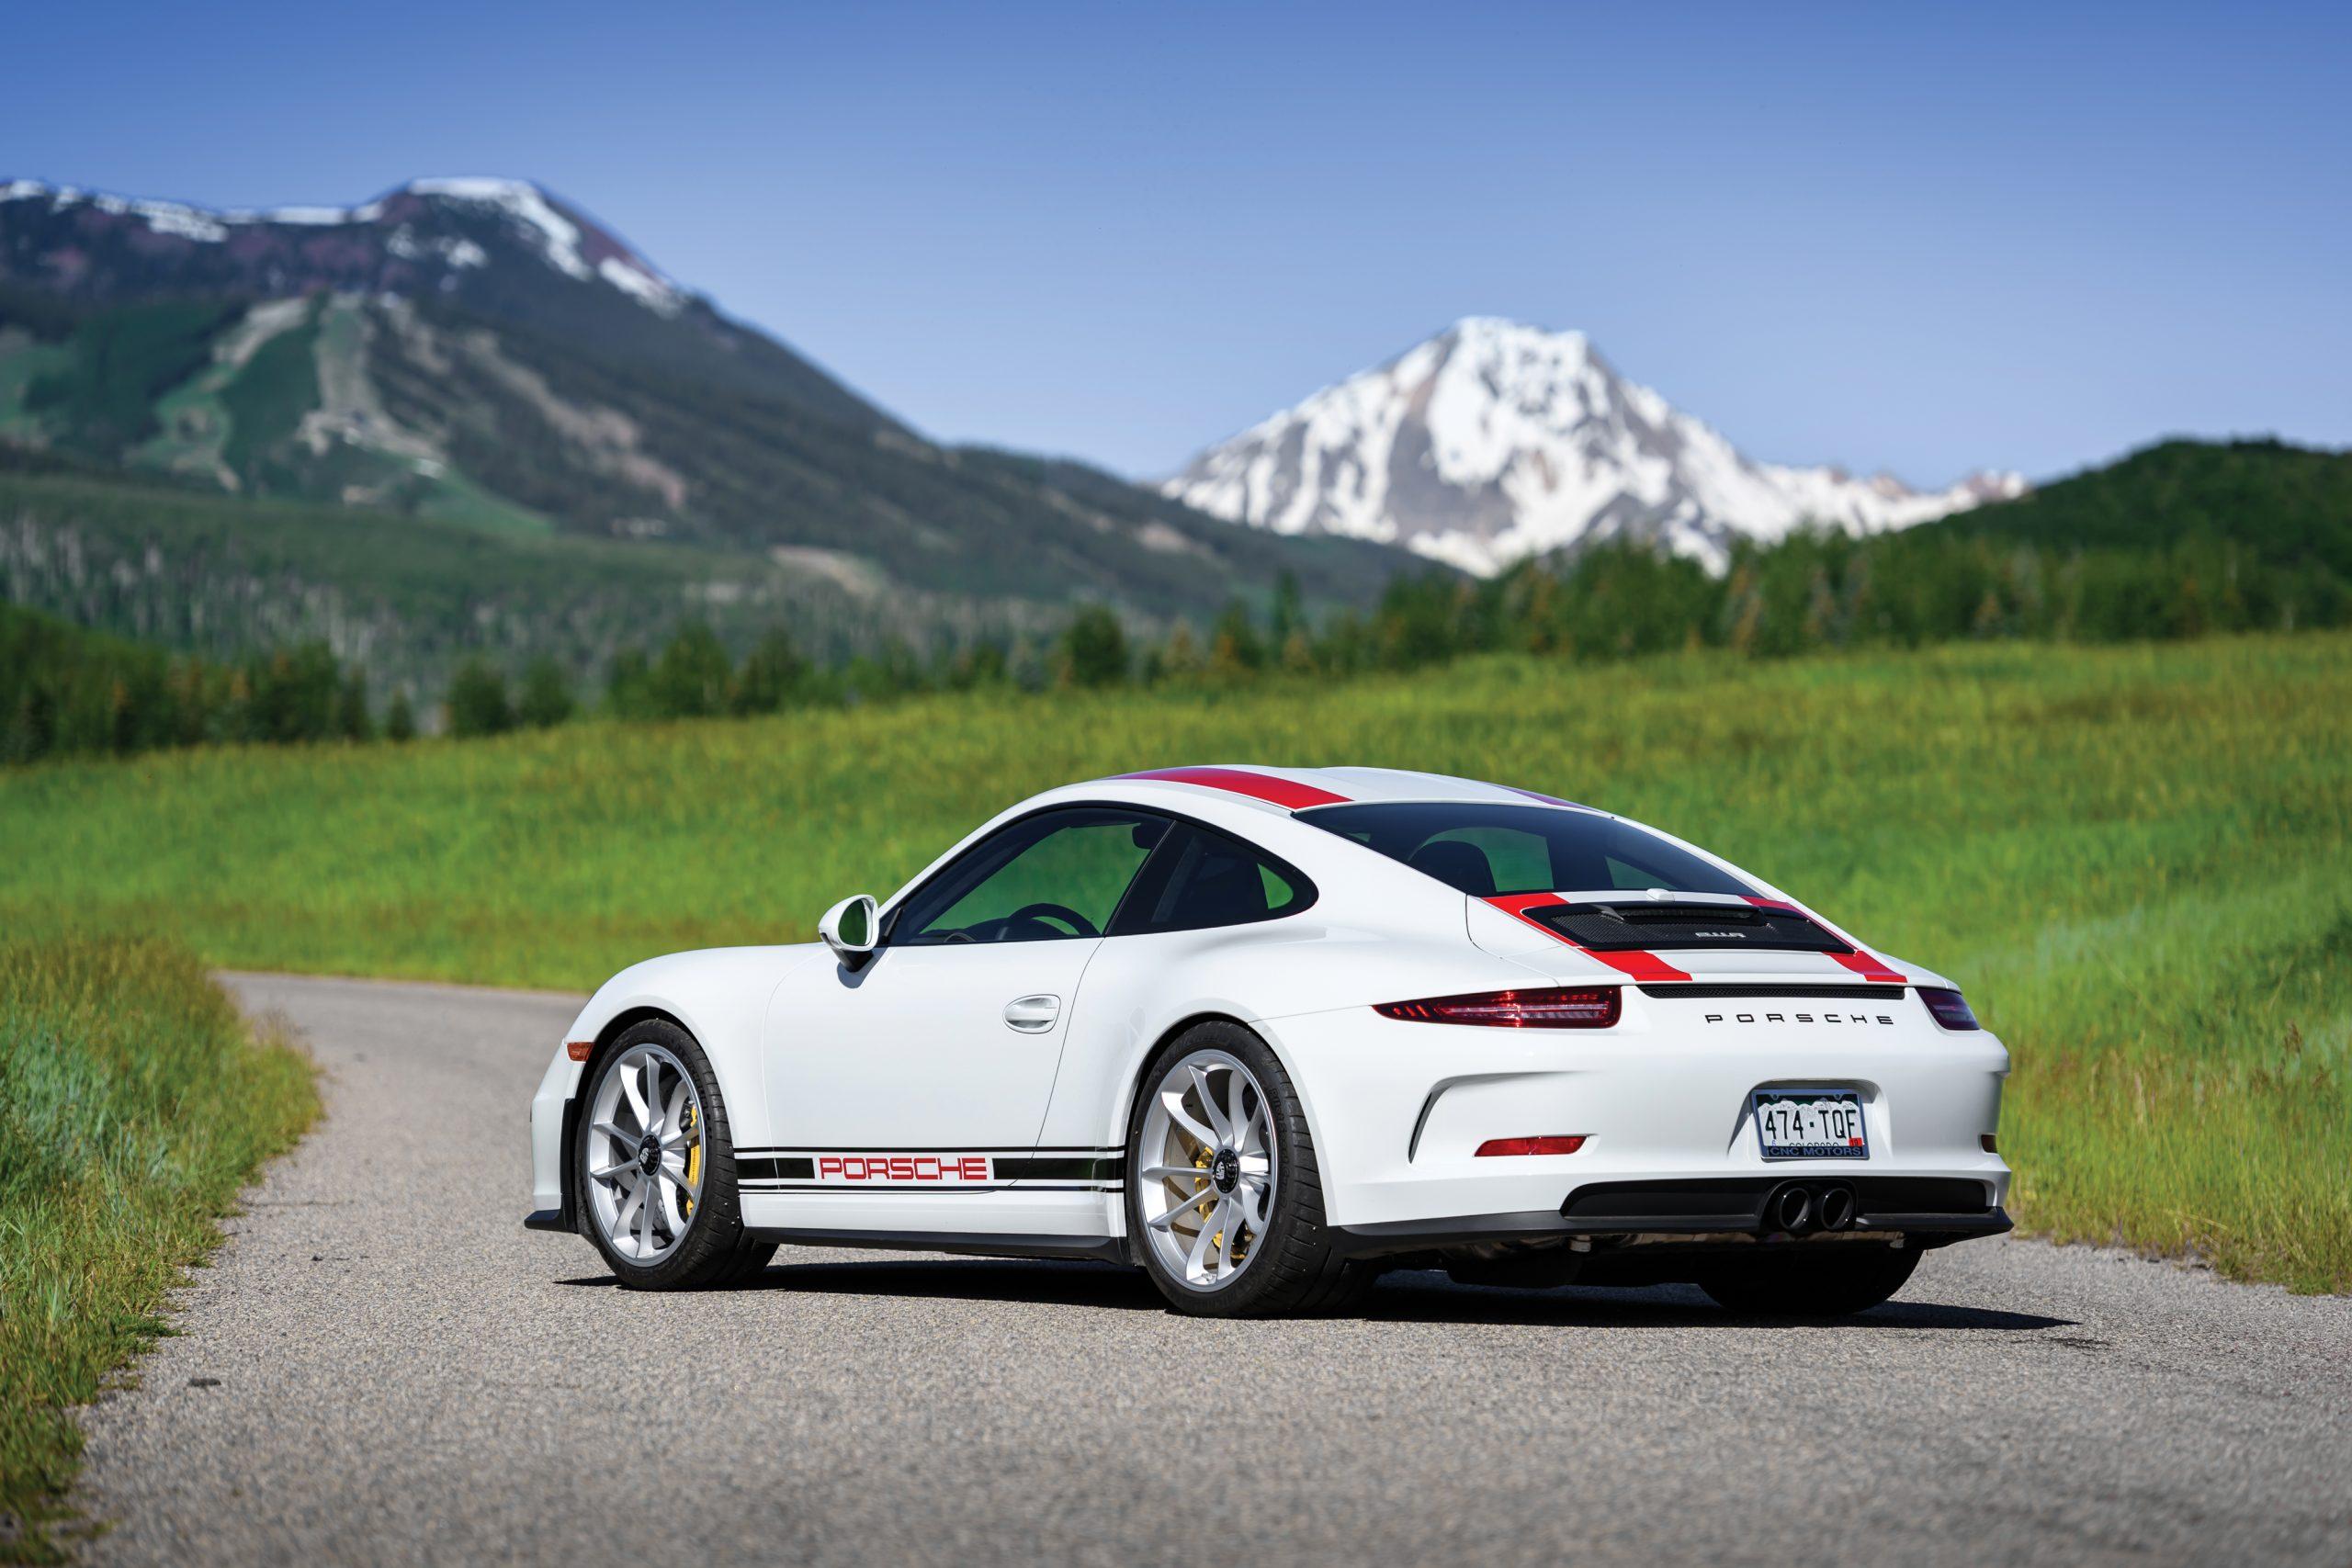 2016-Porsche-911-R rear three-quarter